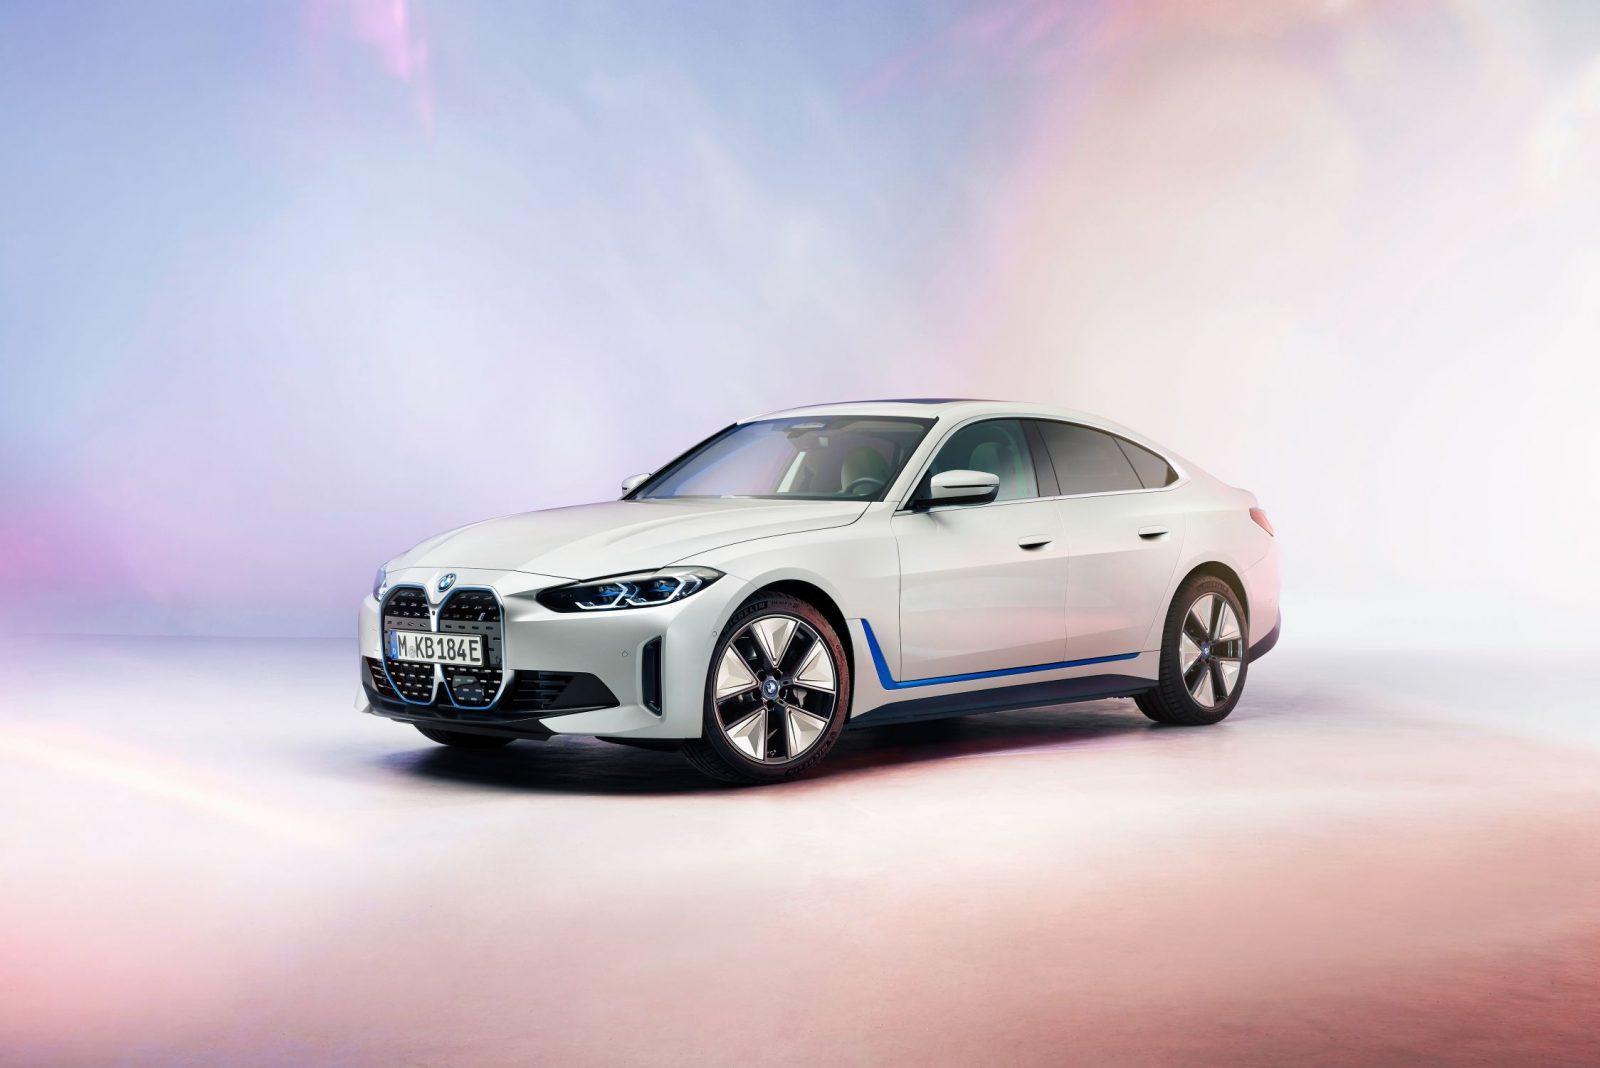 i4 M50 BMW ix